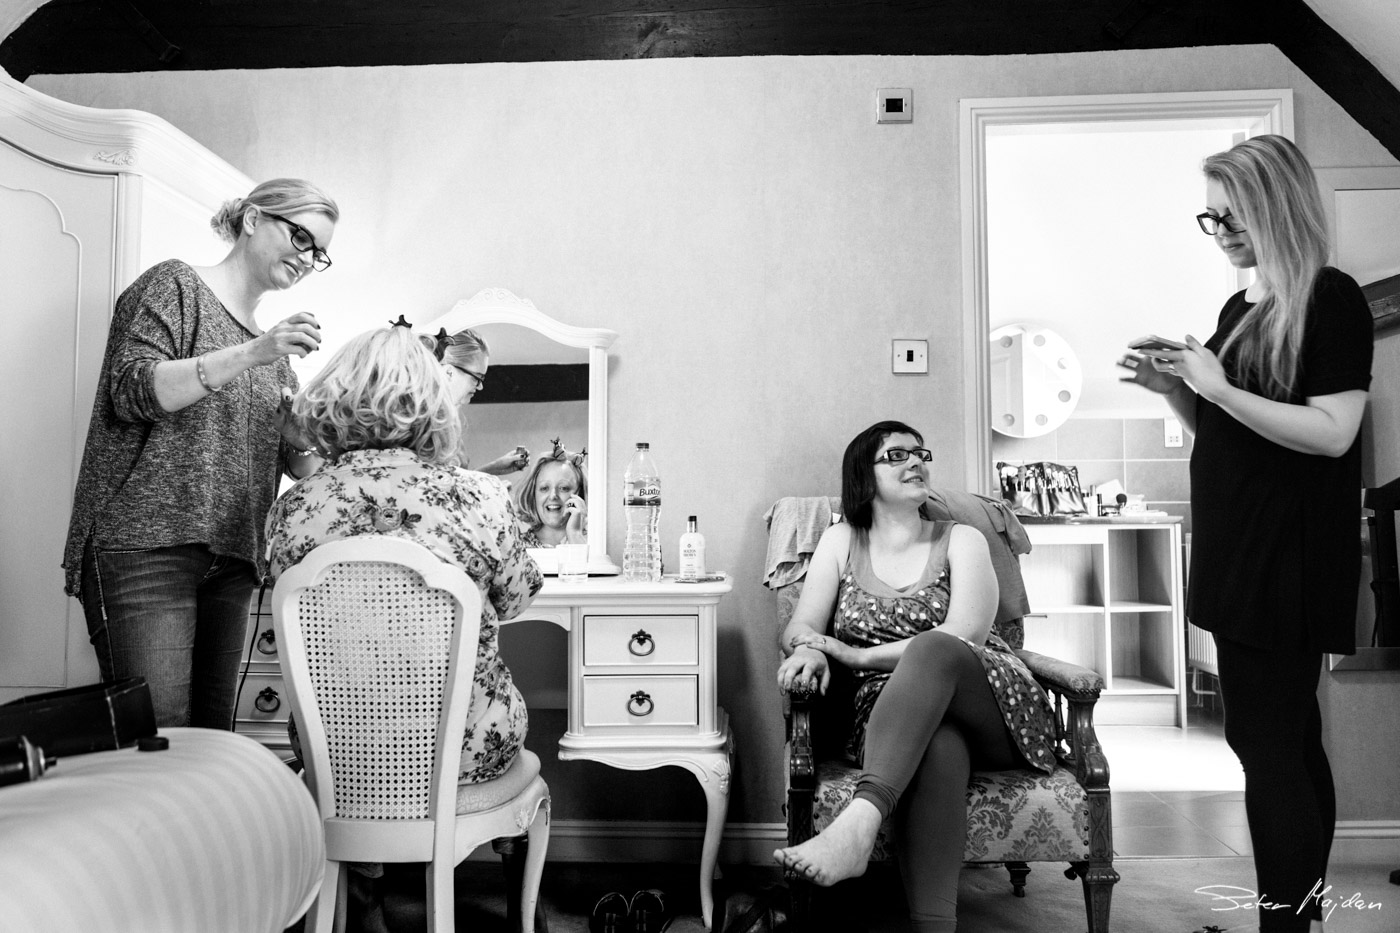 Colwick-hall-wedding-photography-2.jpg